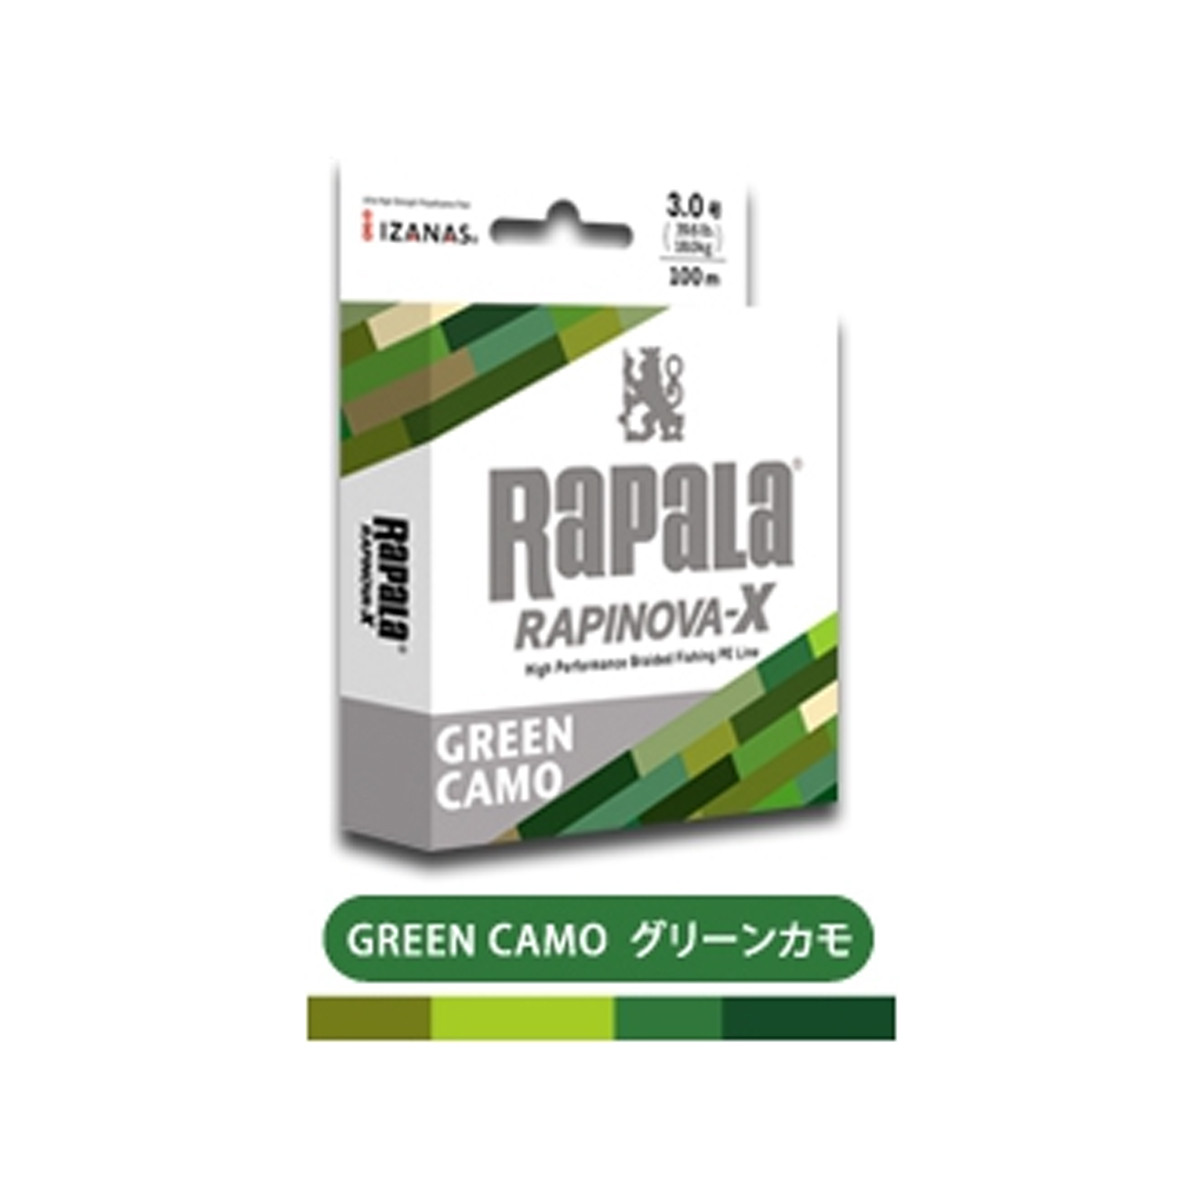 RAPALA RAPINOVA-X 100M GREEN CAMO